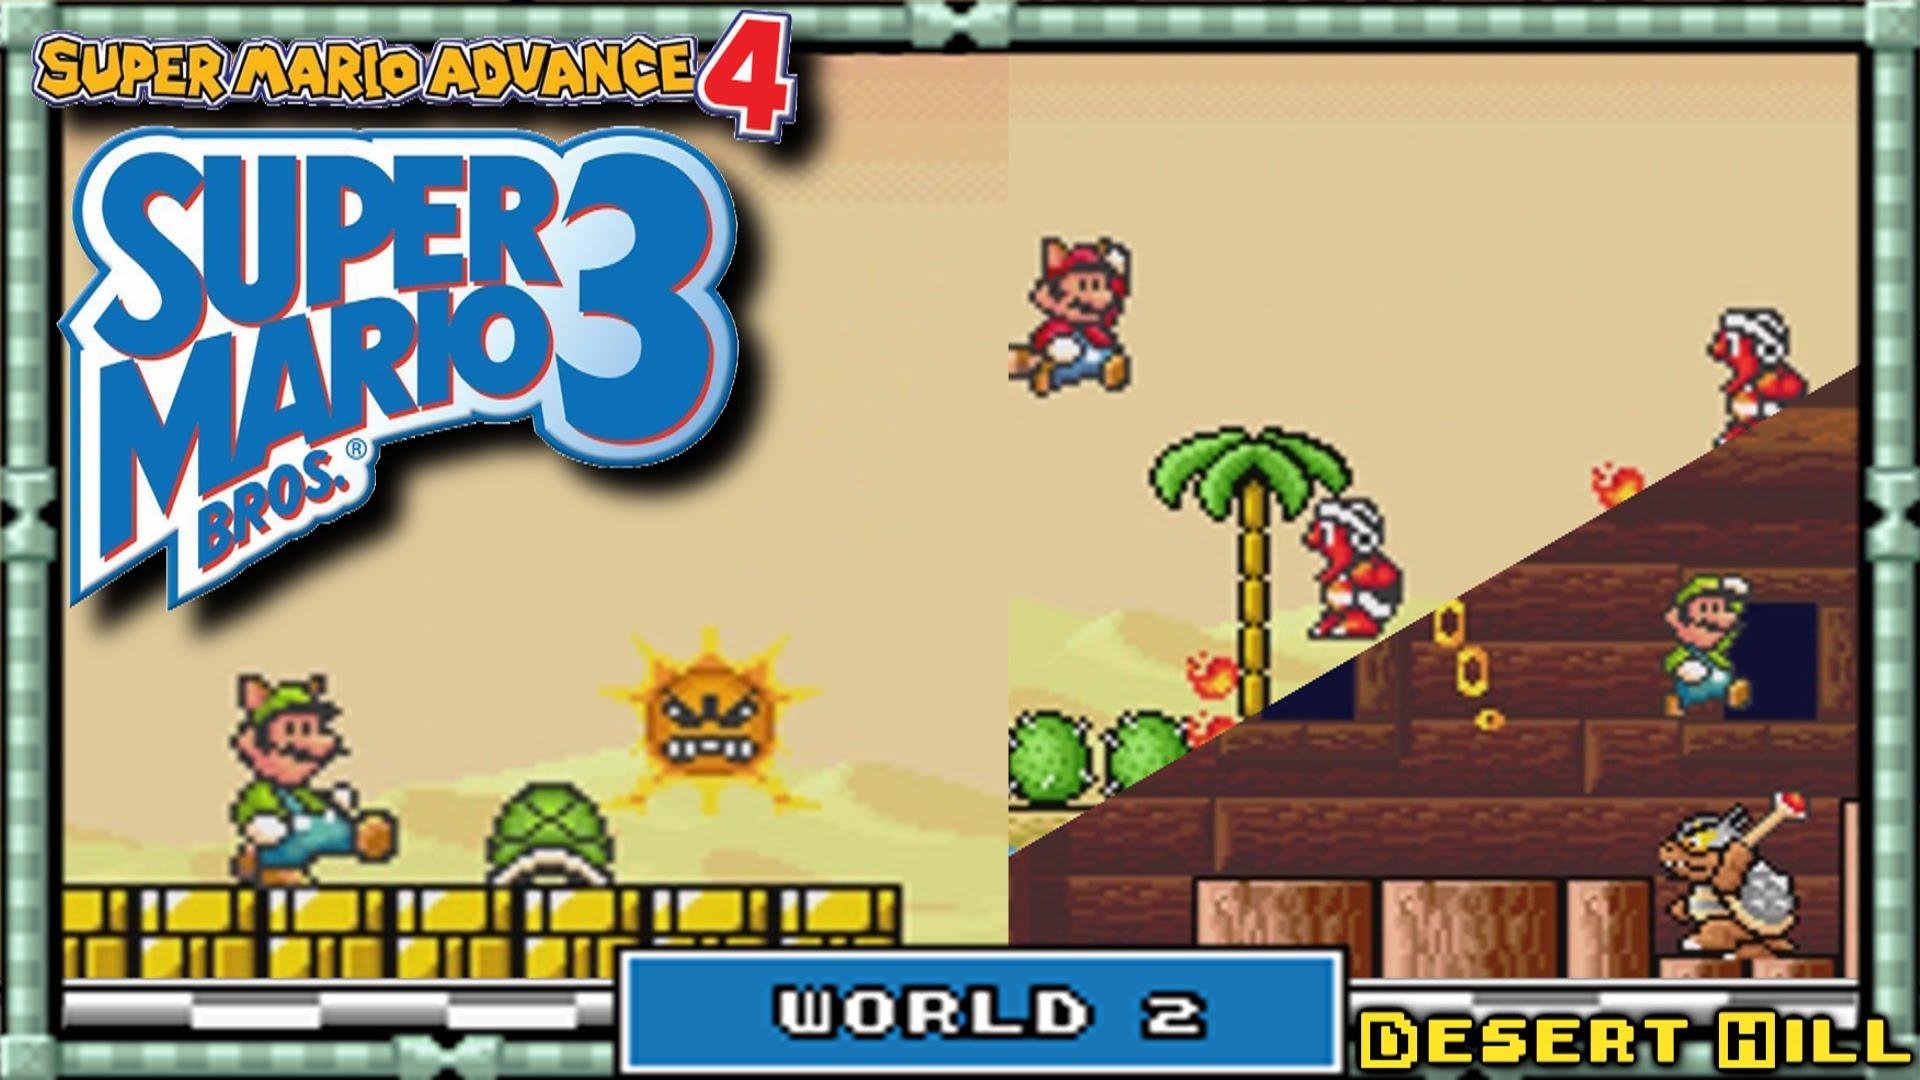 Super Mario Advance 4 - Super Mario Bros  3 wallpapers